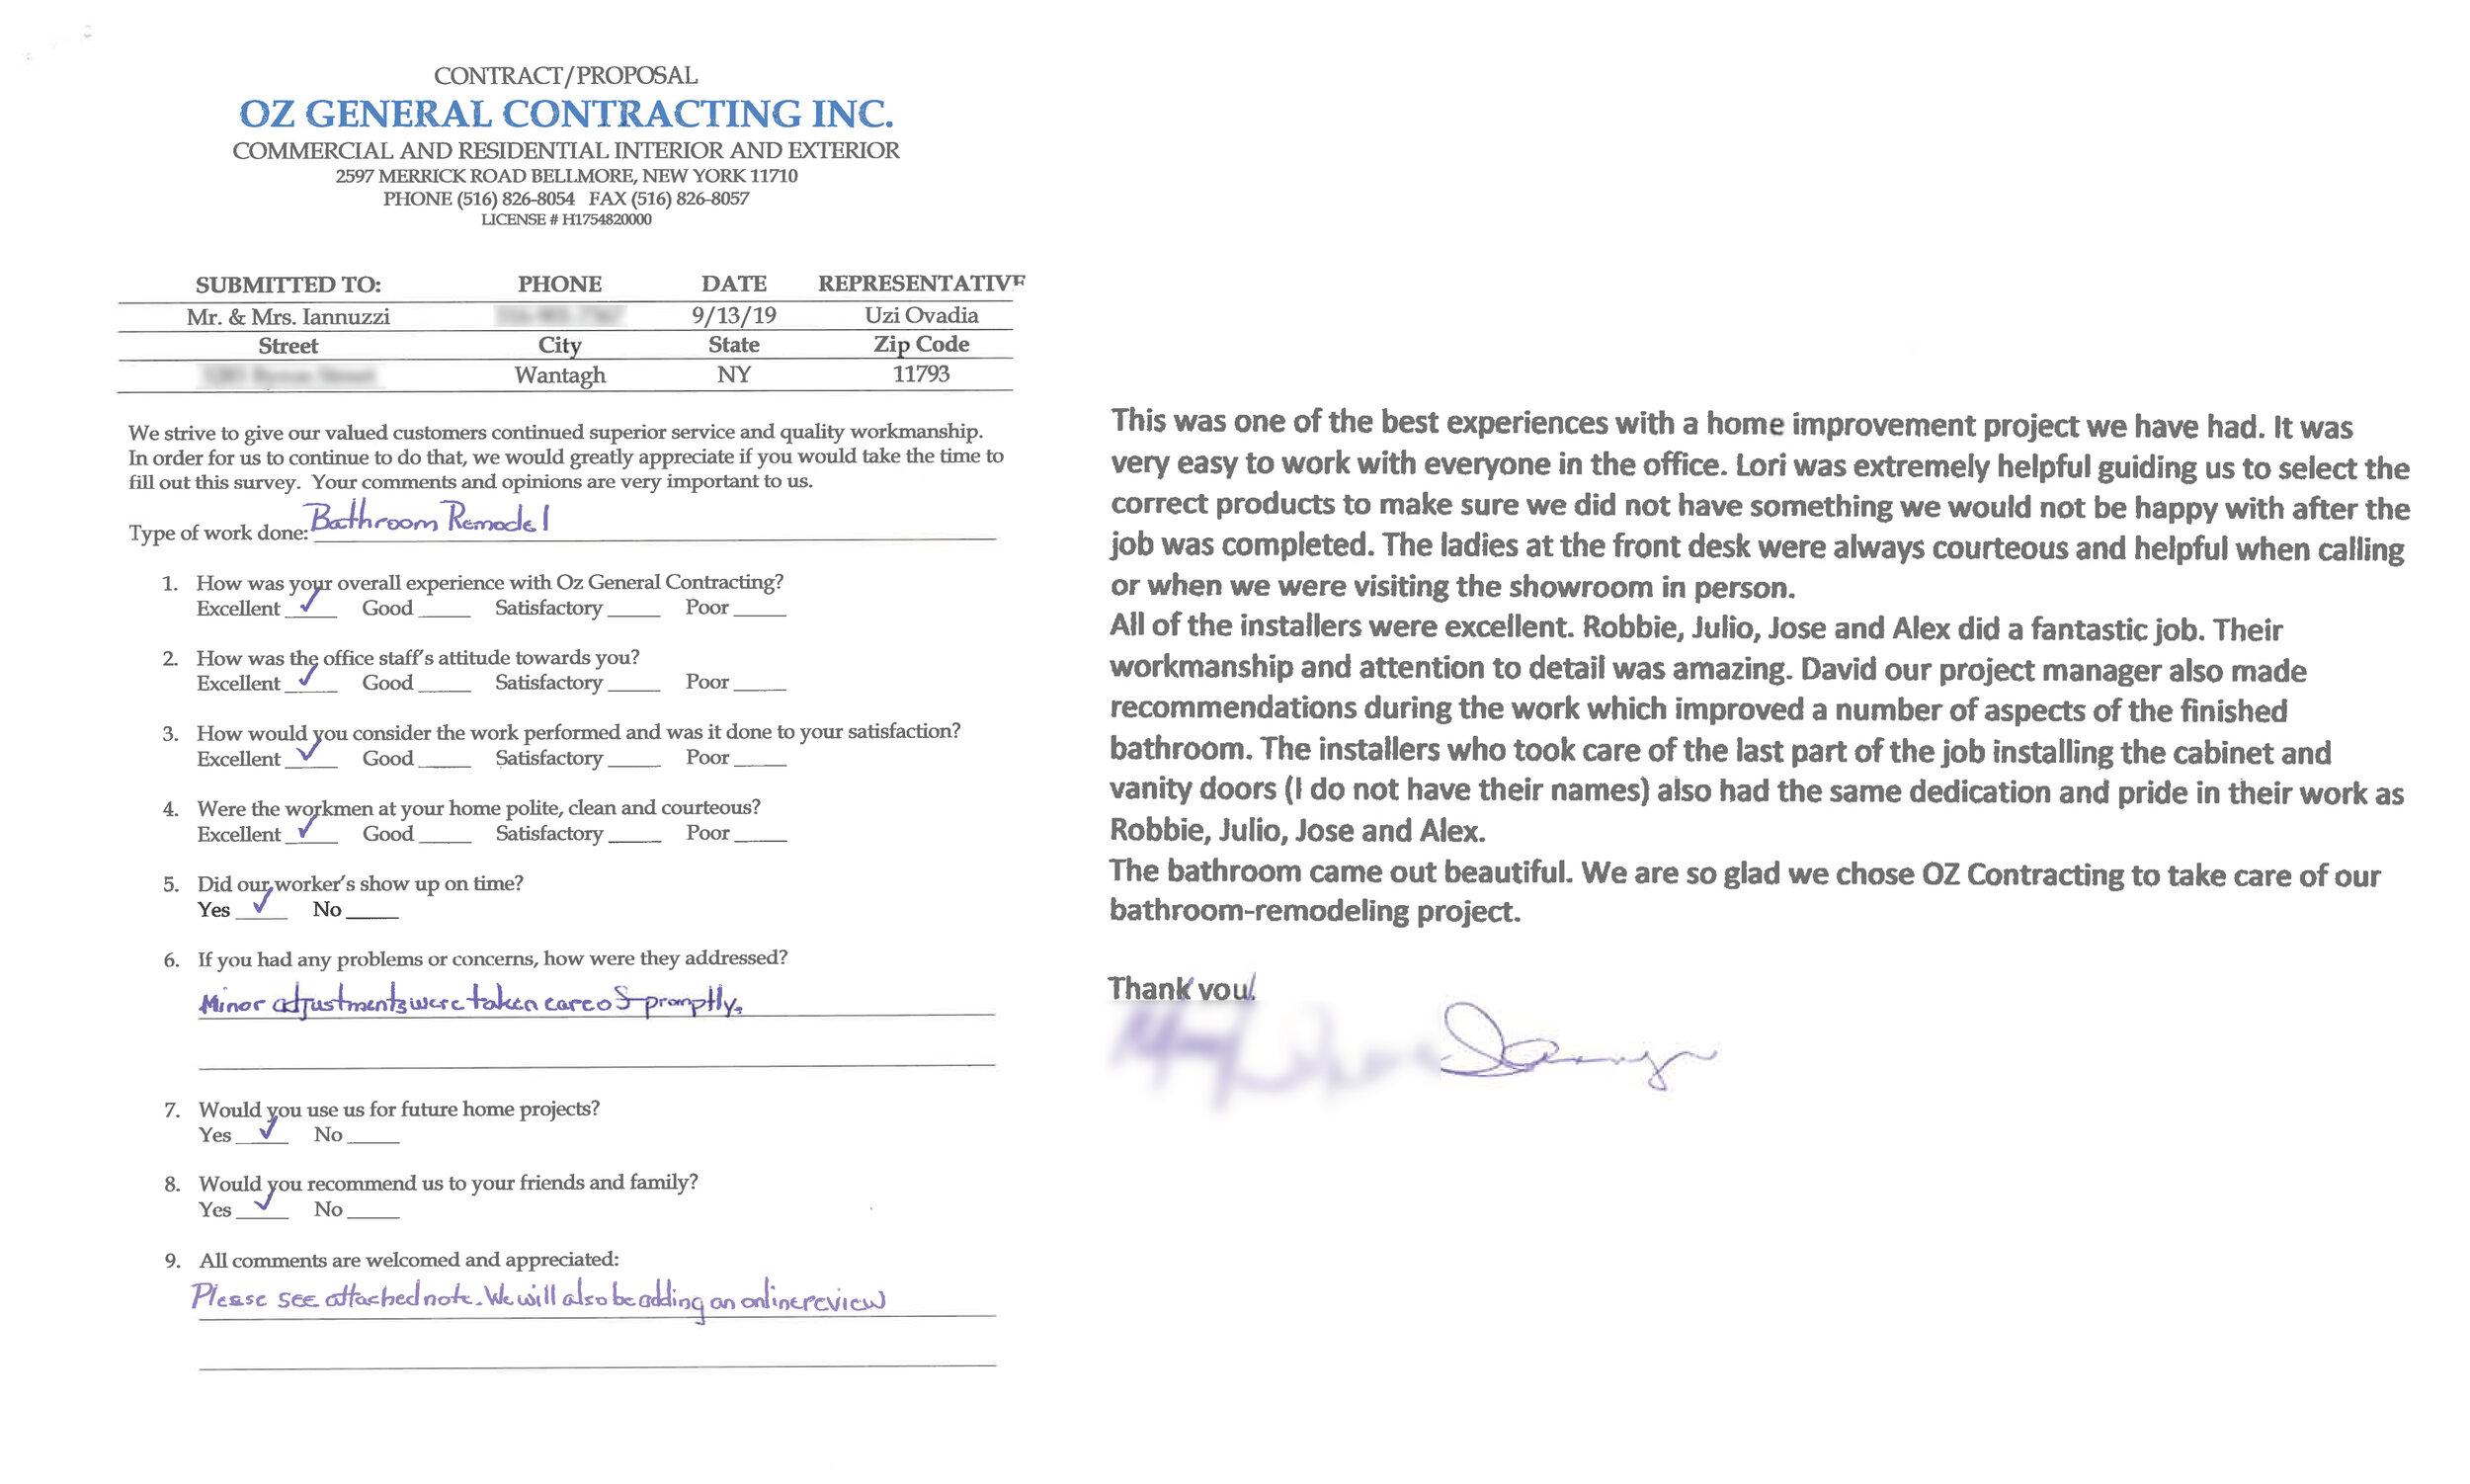 Lanuzzi Survey and Letter 9-13-19.jpg